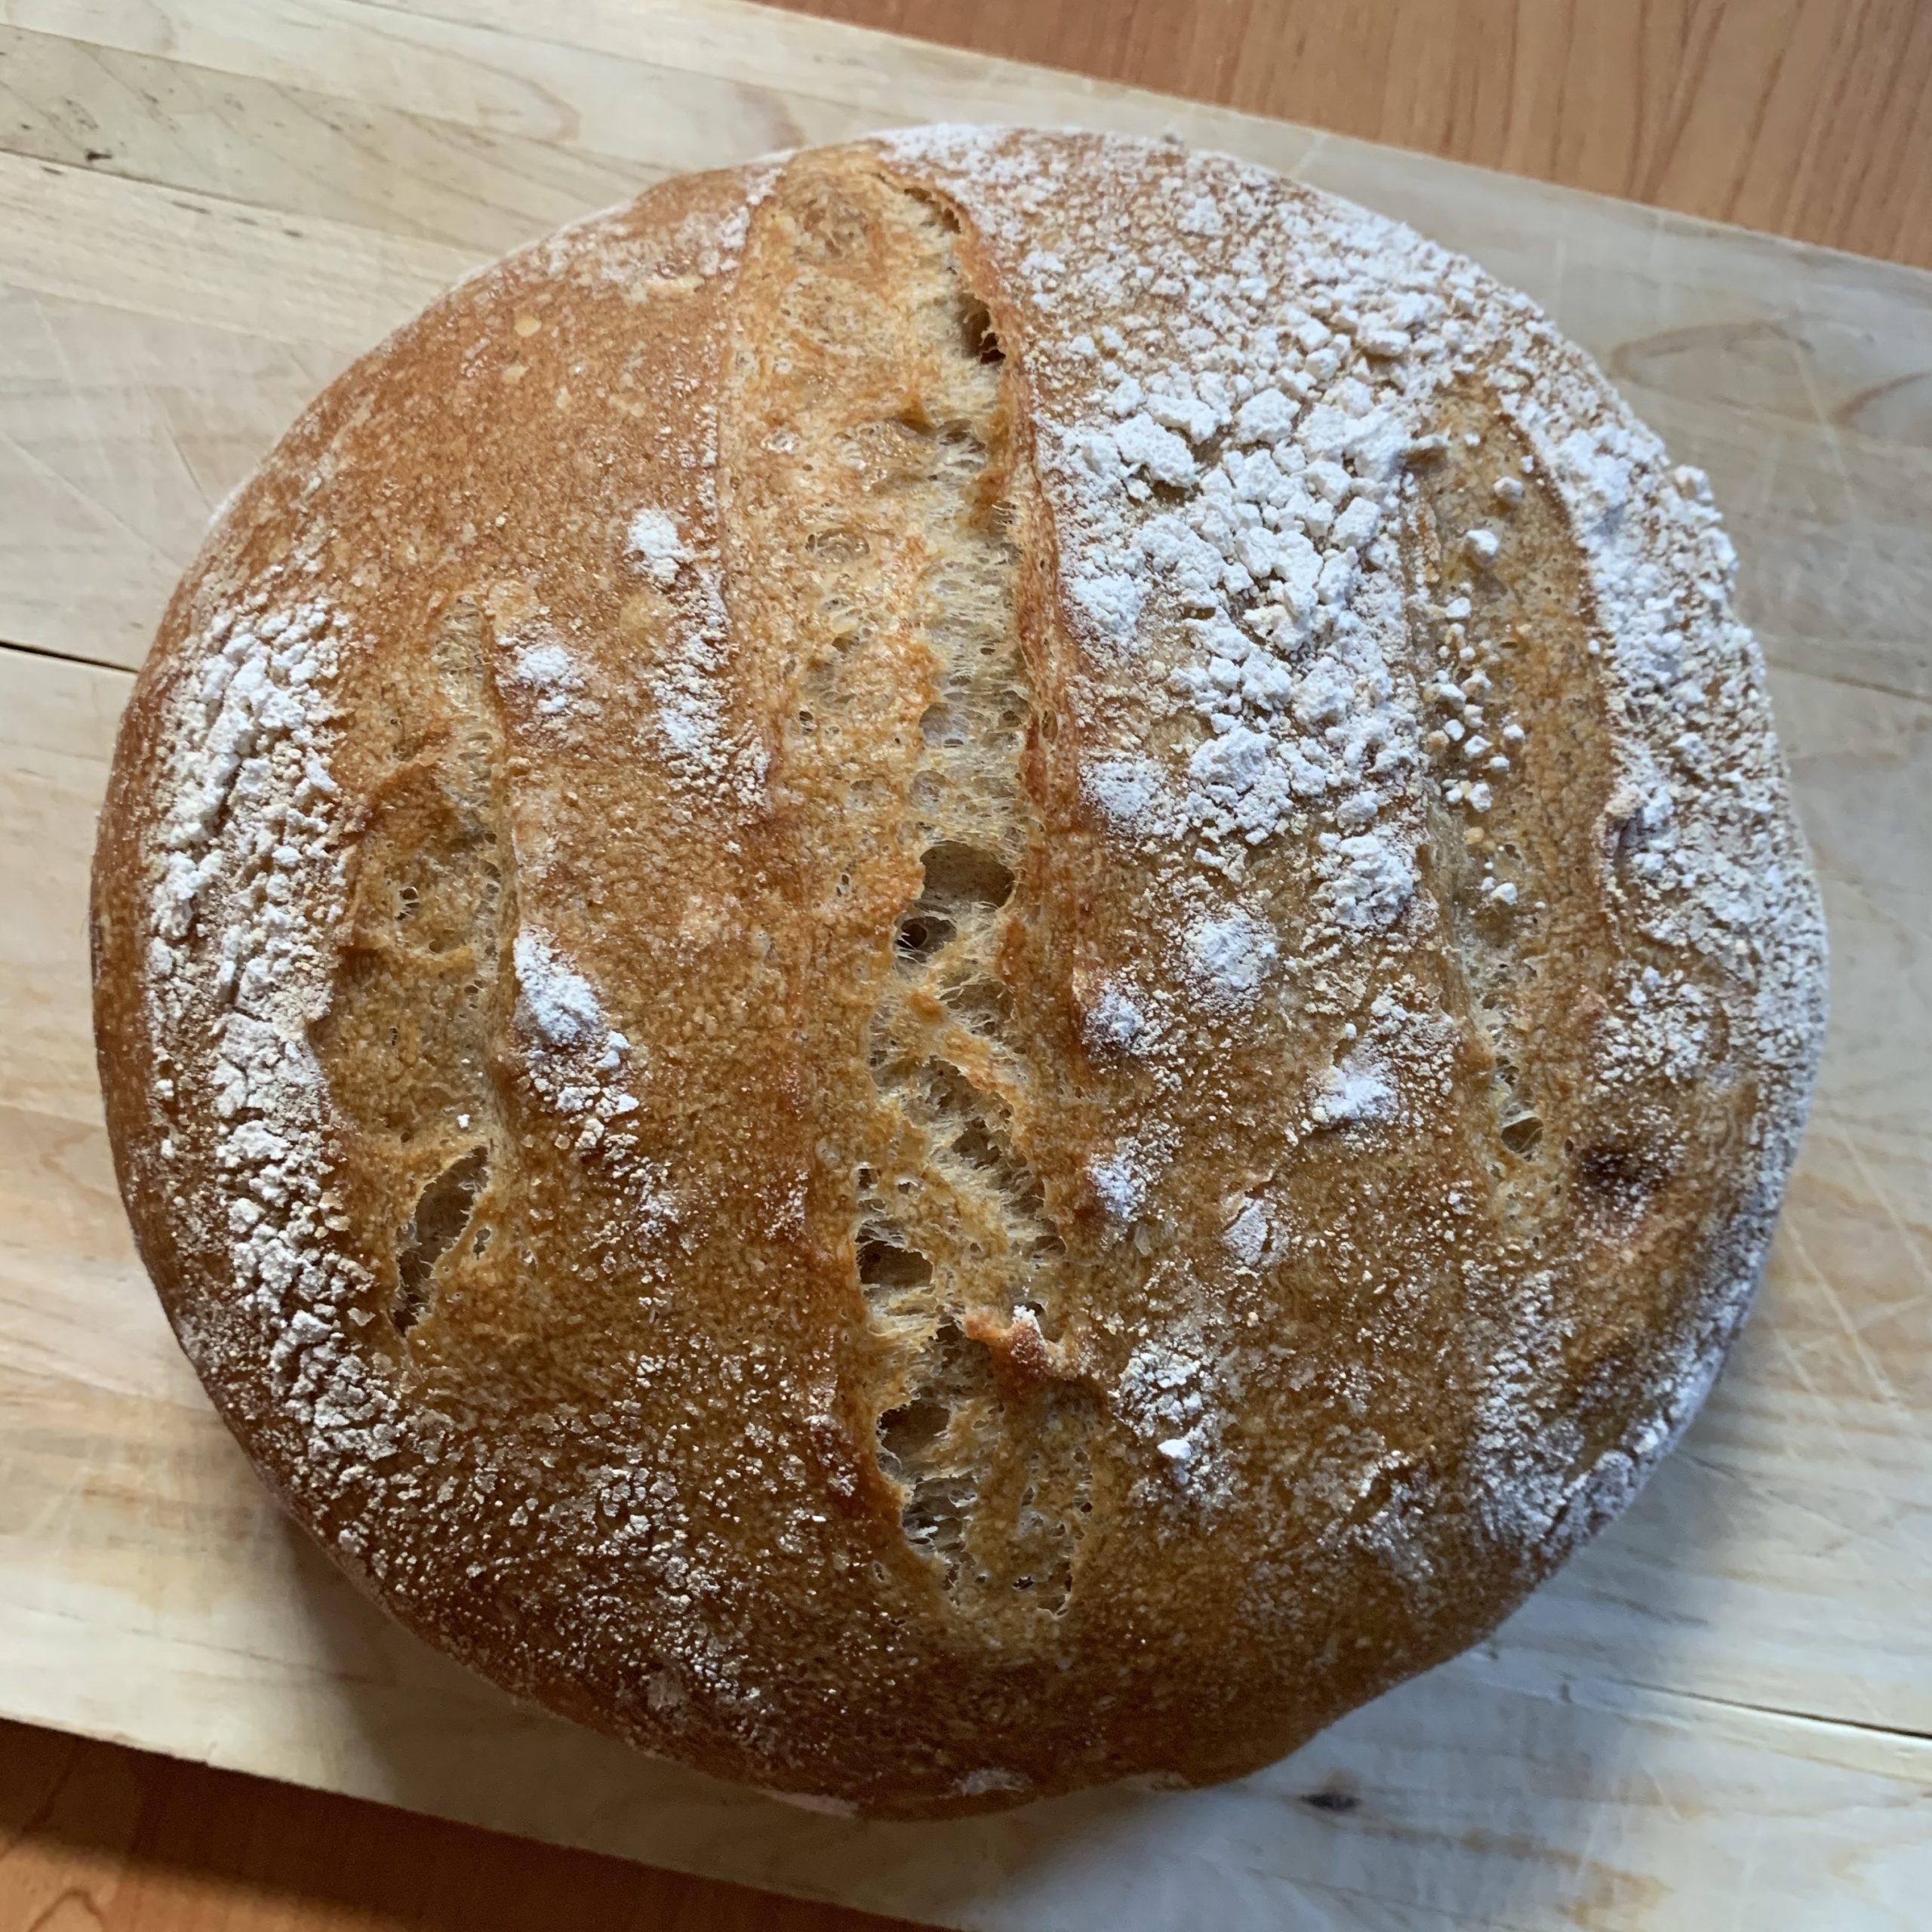 Sourdough Bread for the Apocalypse